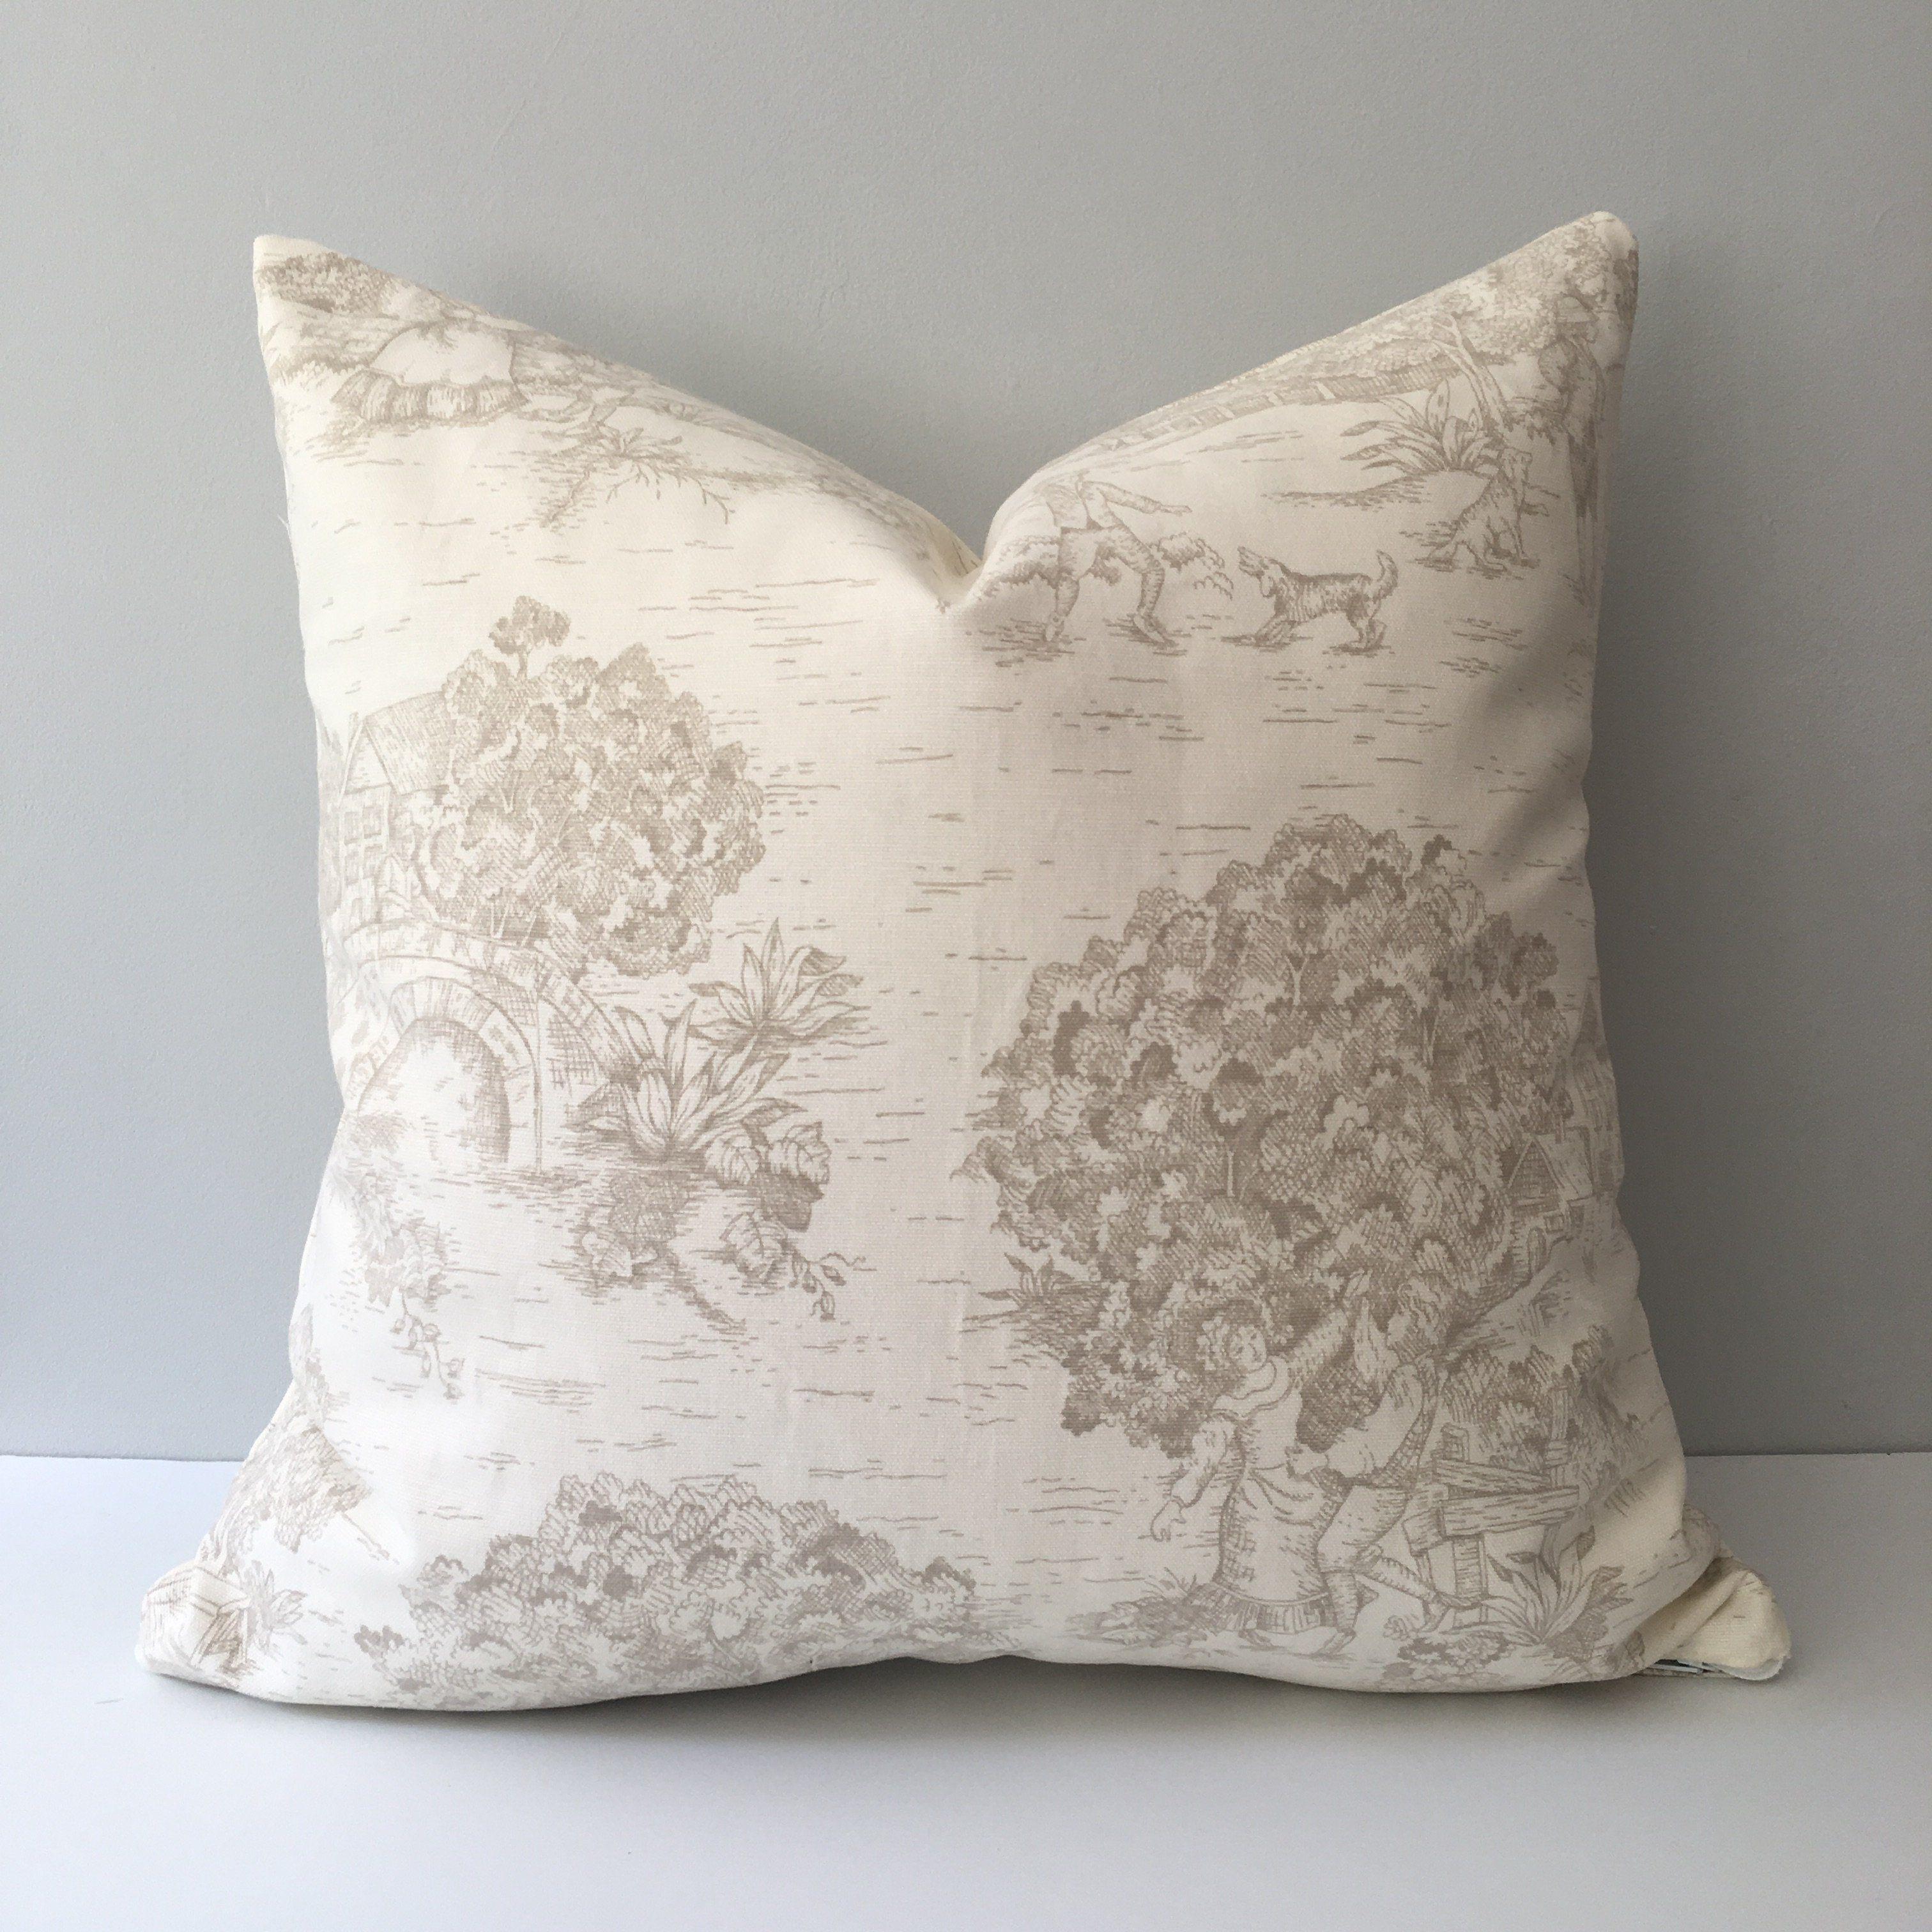 18x18 Throw Pillow Covers Throw Pillows